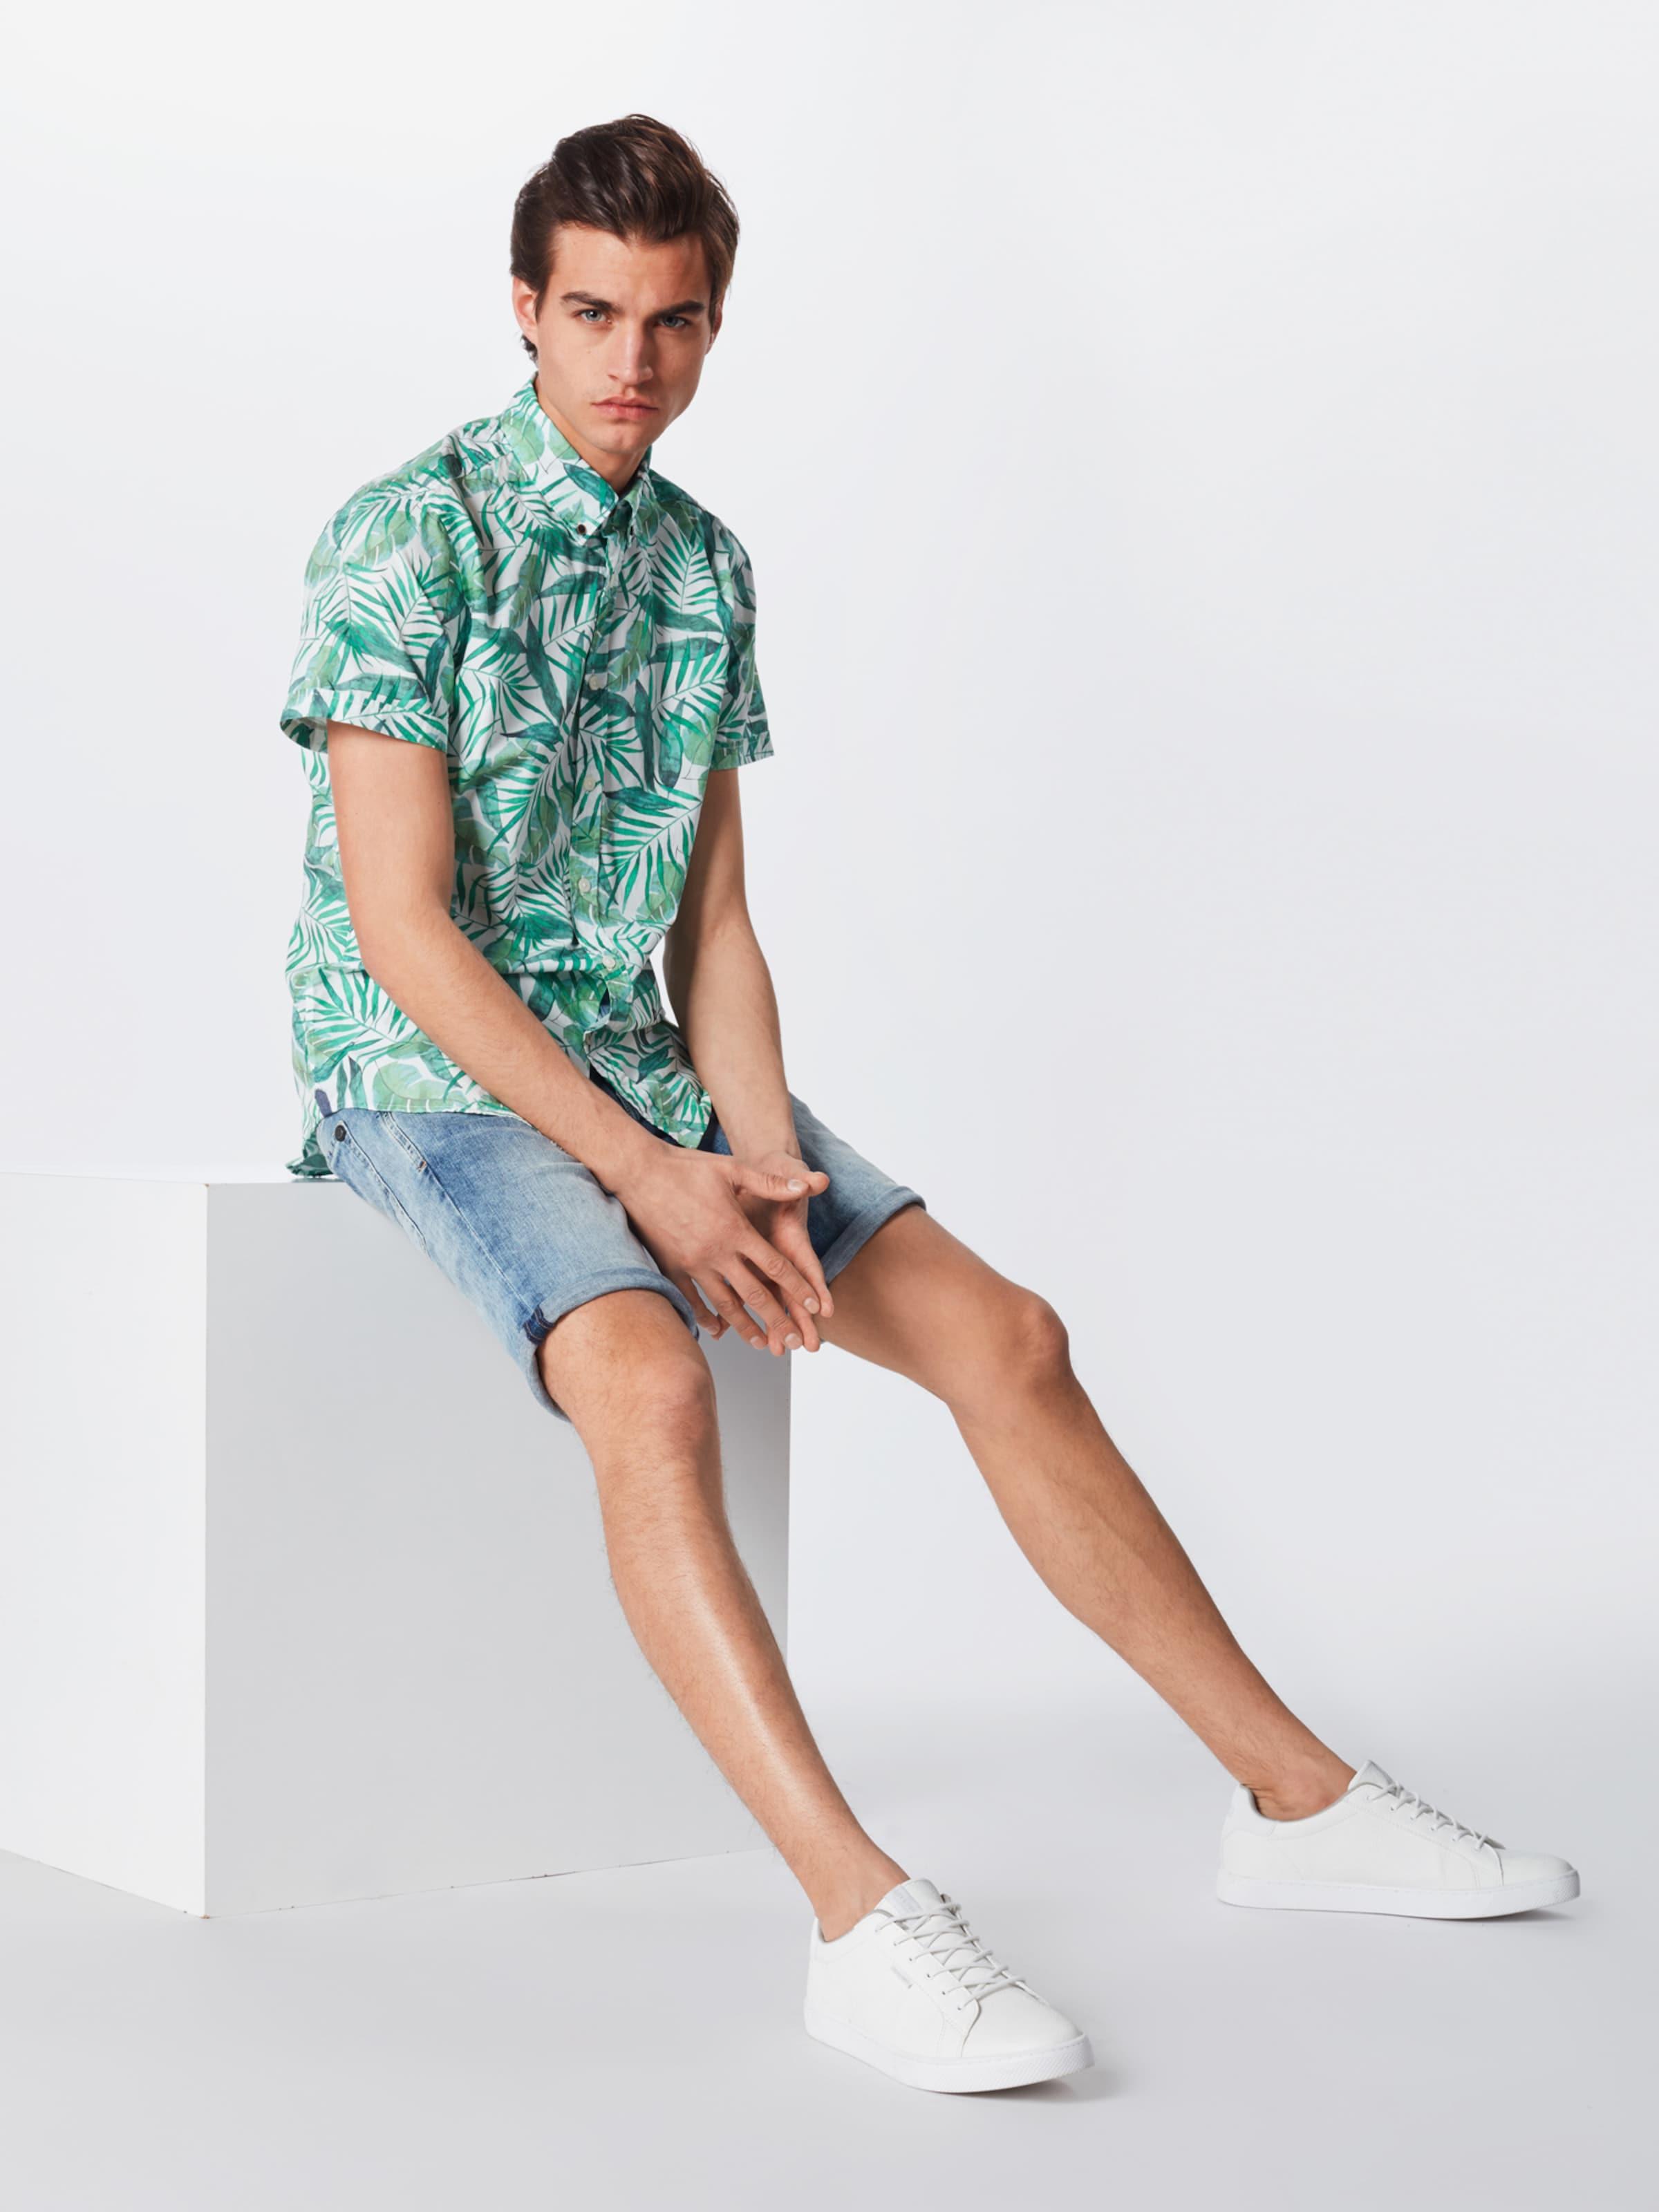 'allan' Pepe Jeans Hemd GrünWeiß In vm8nNOw0